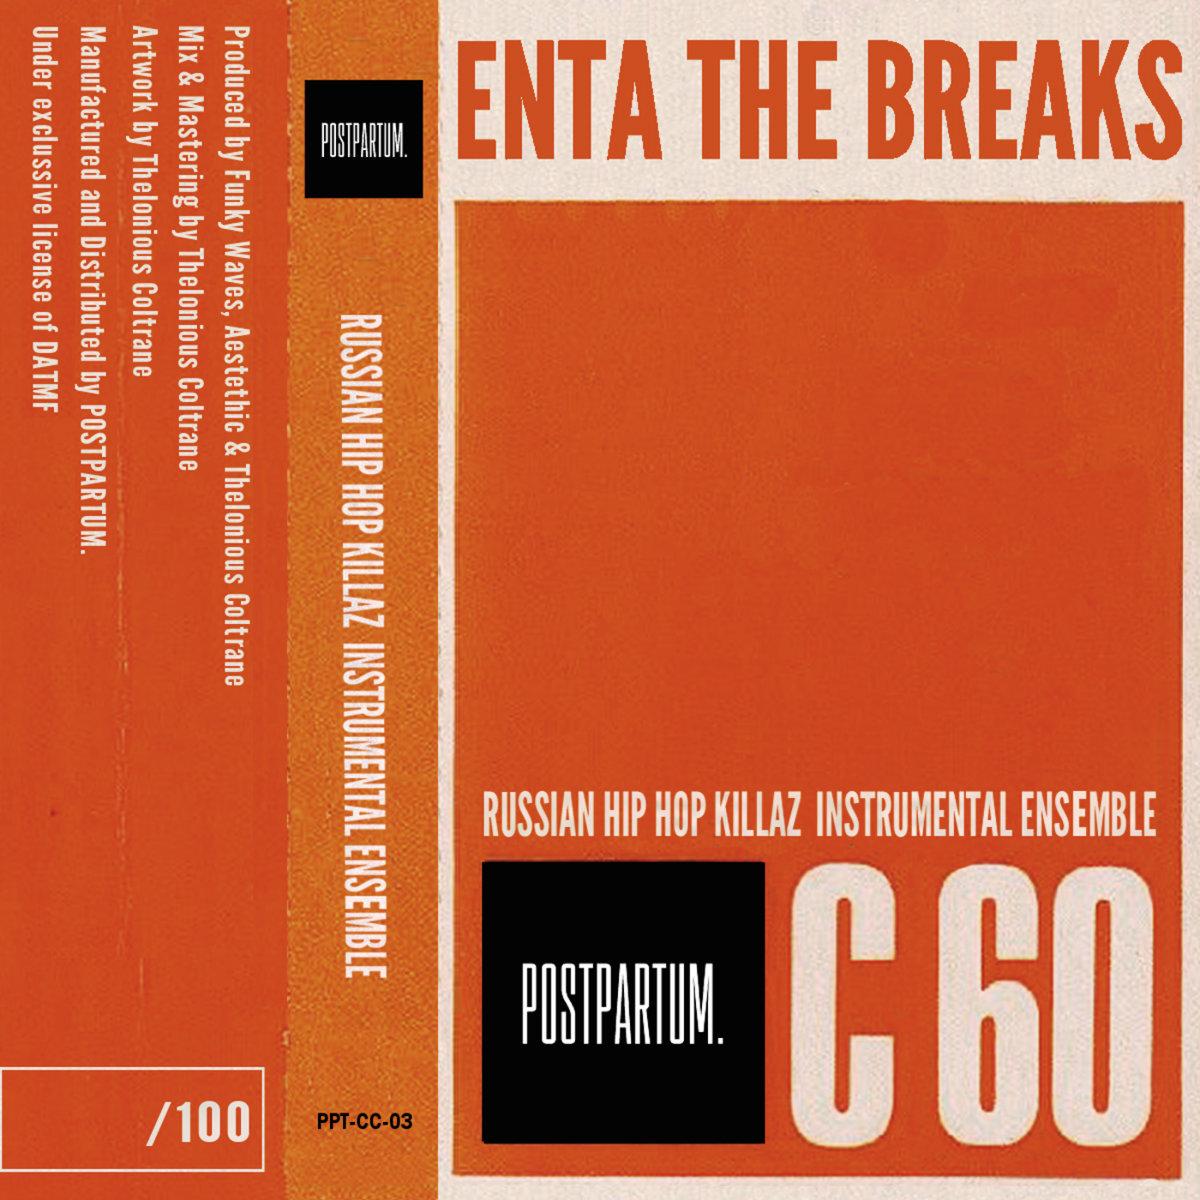 Enta The Breaks | POSTPARTUM